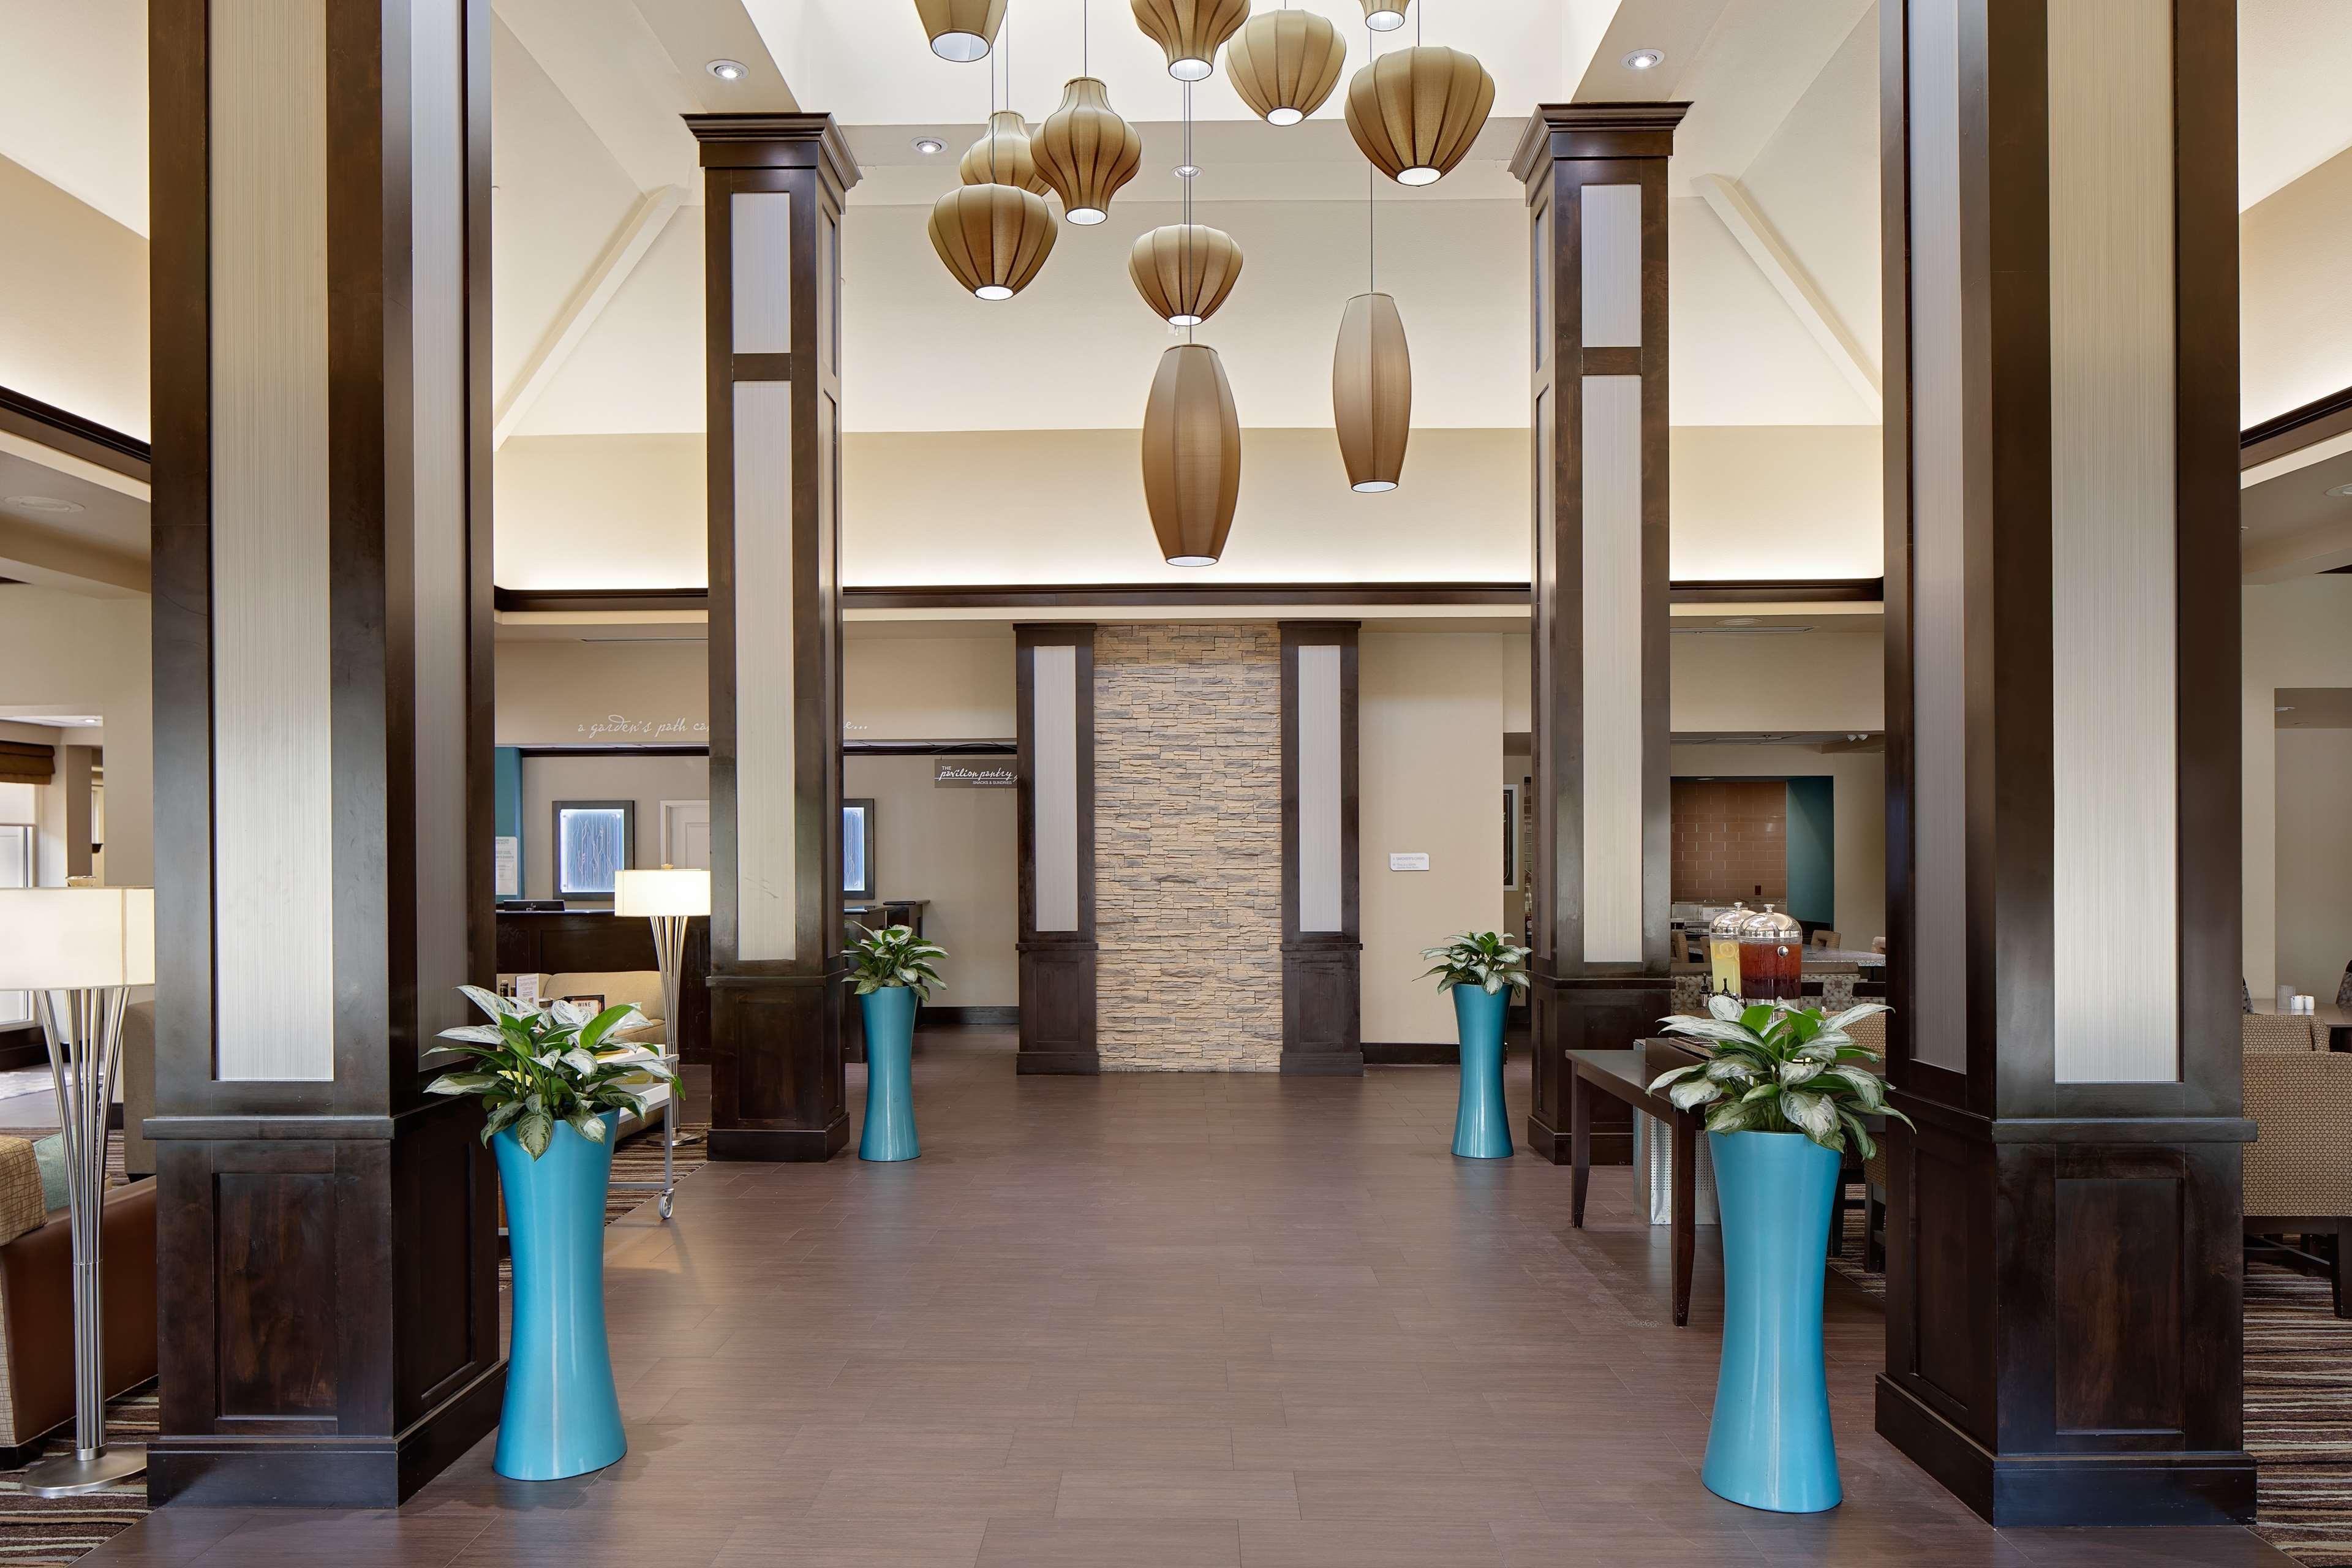 Hilton Garden Inn DFW Airport South image 9